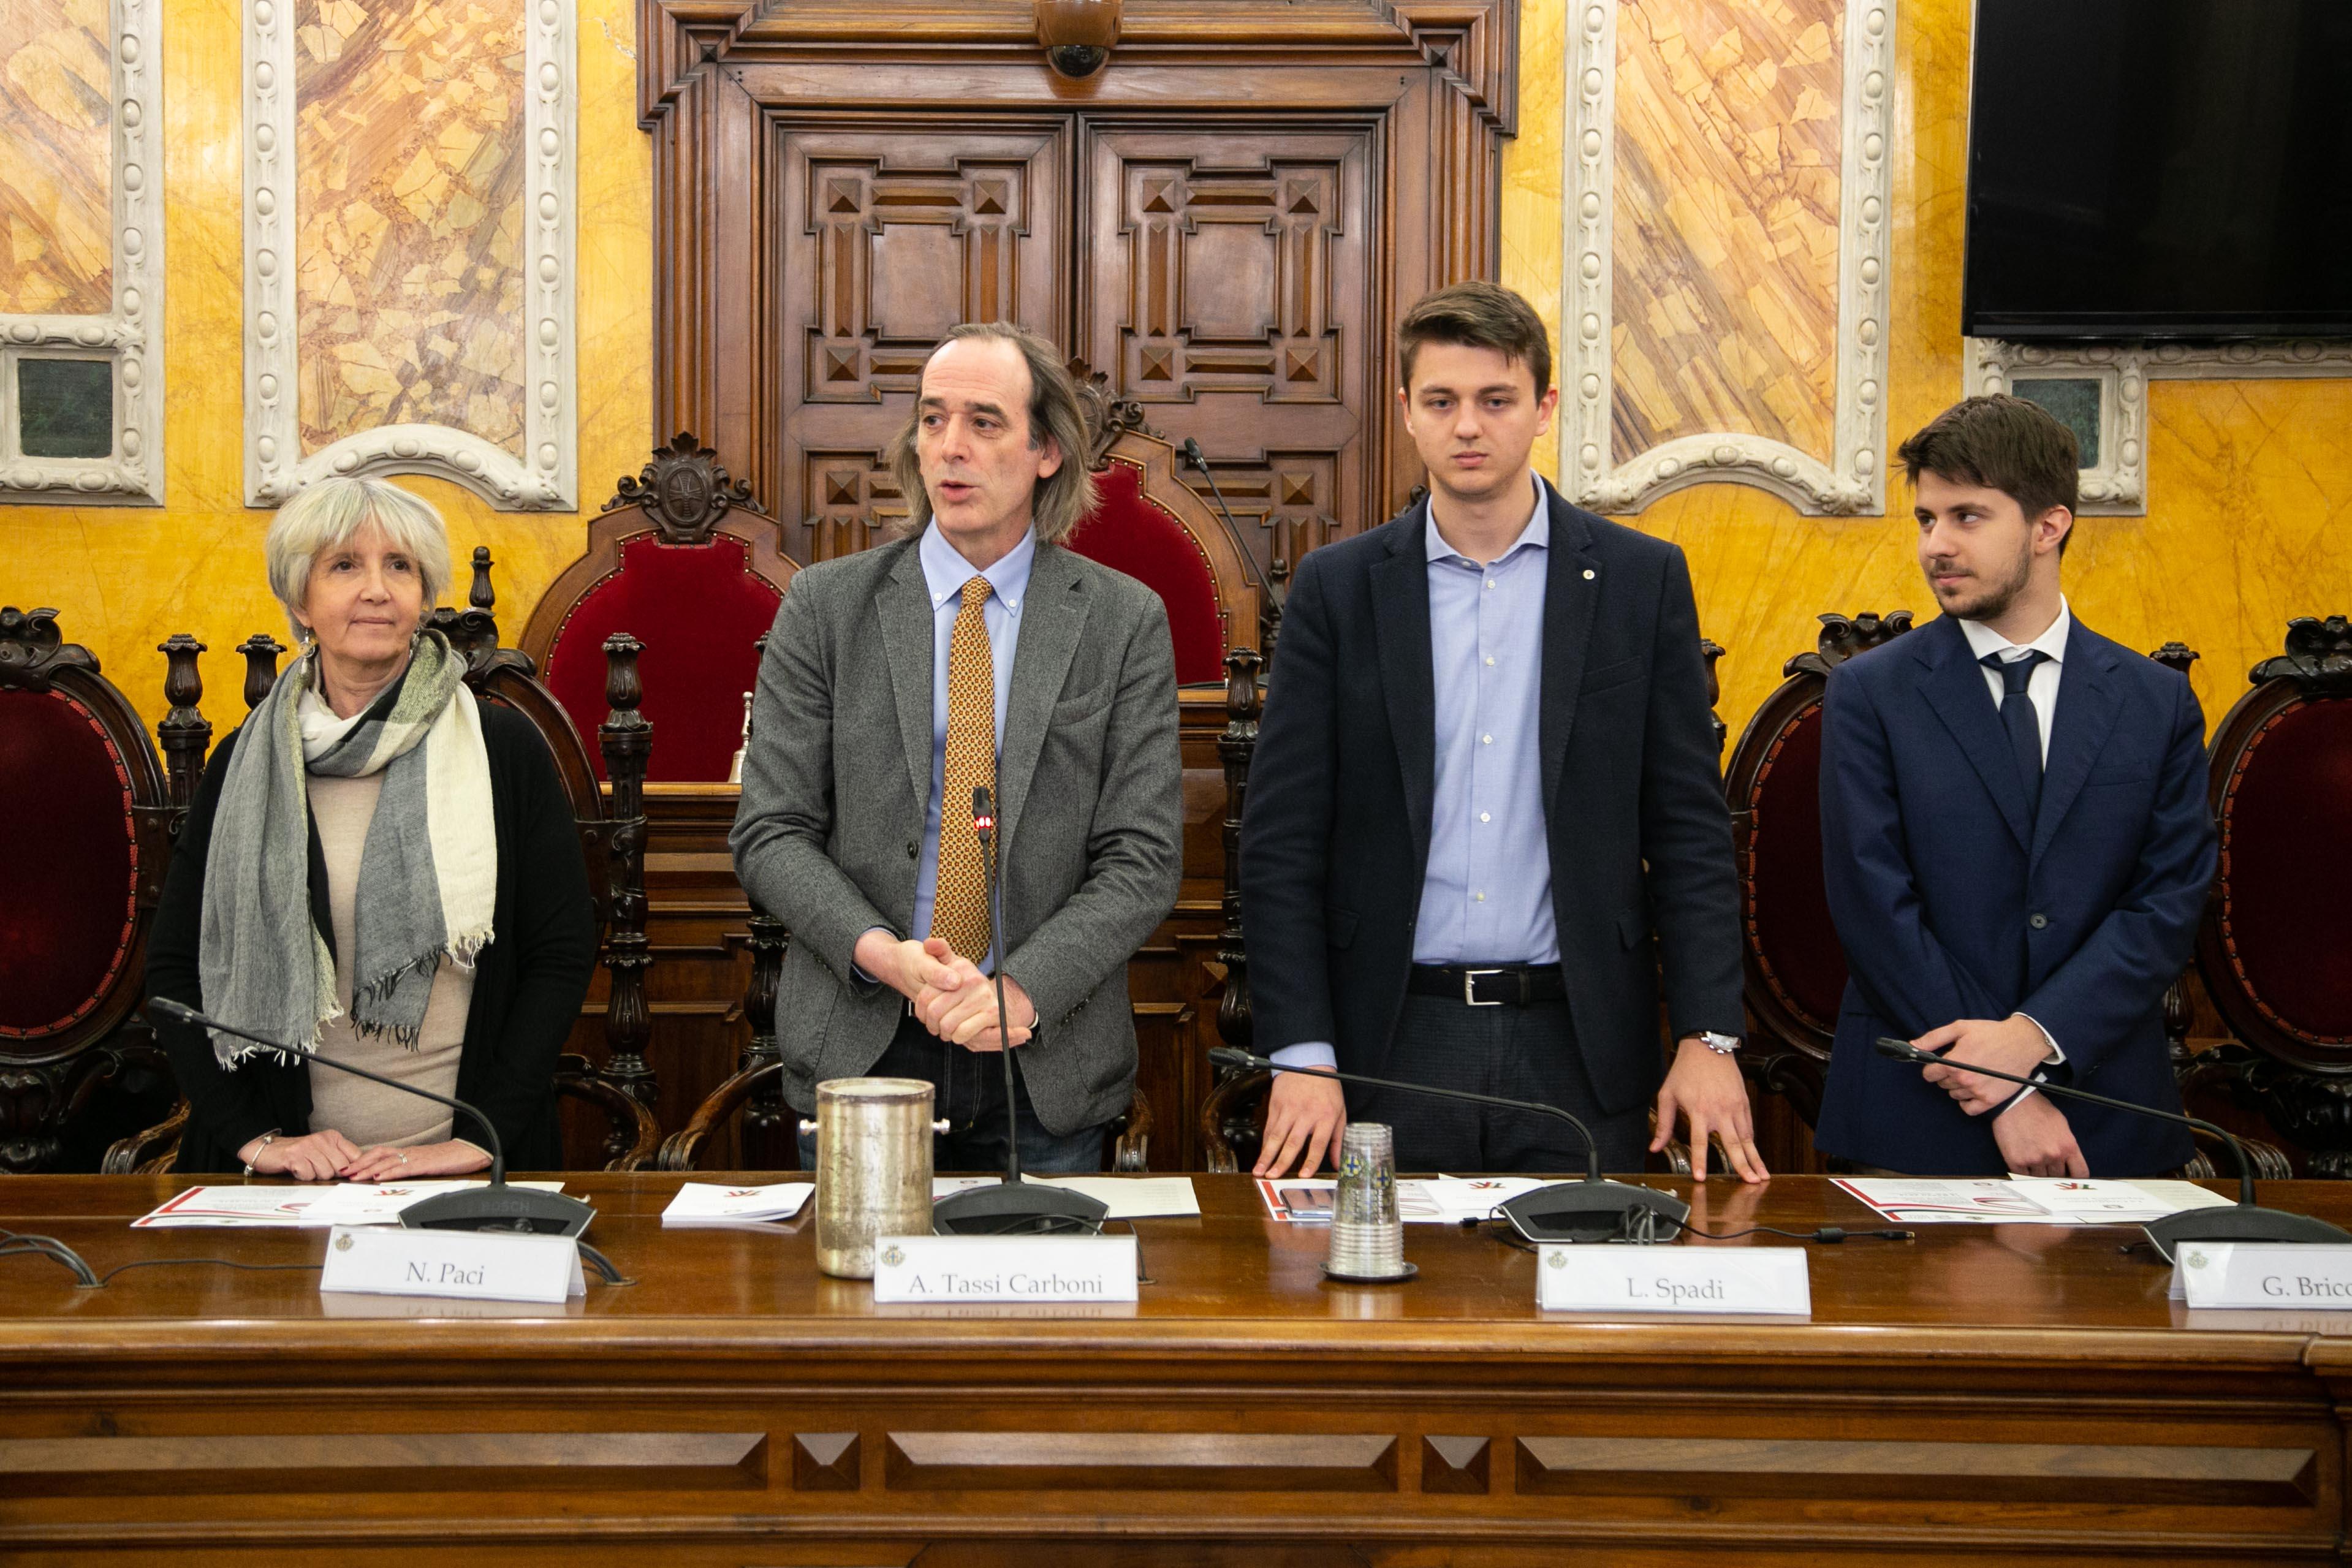 2019 03 13 Paci Tassi-Carboni Spadi consegna Costituzione-1